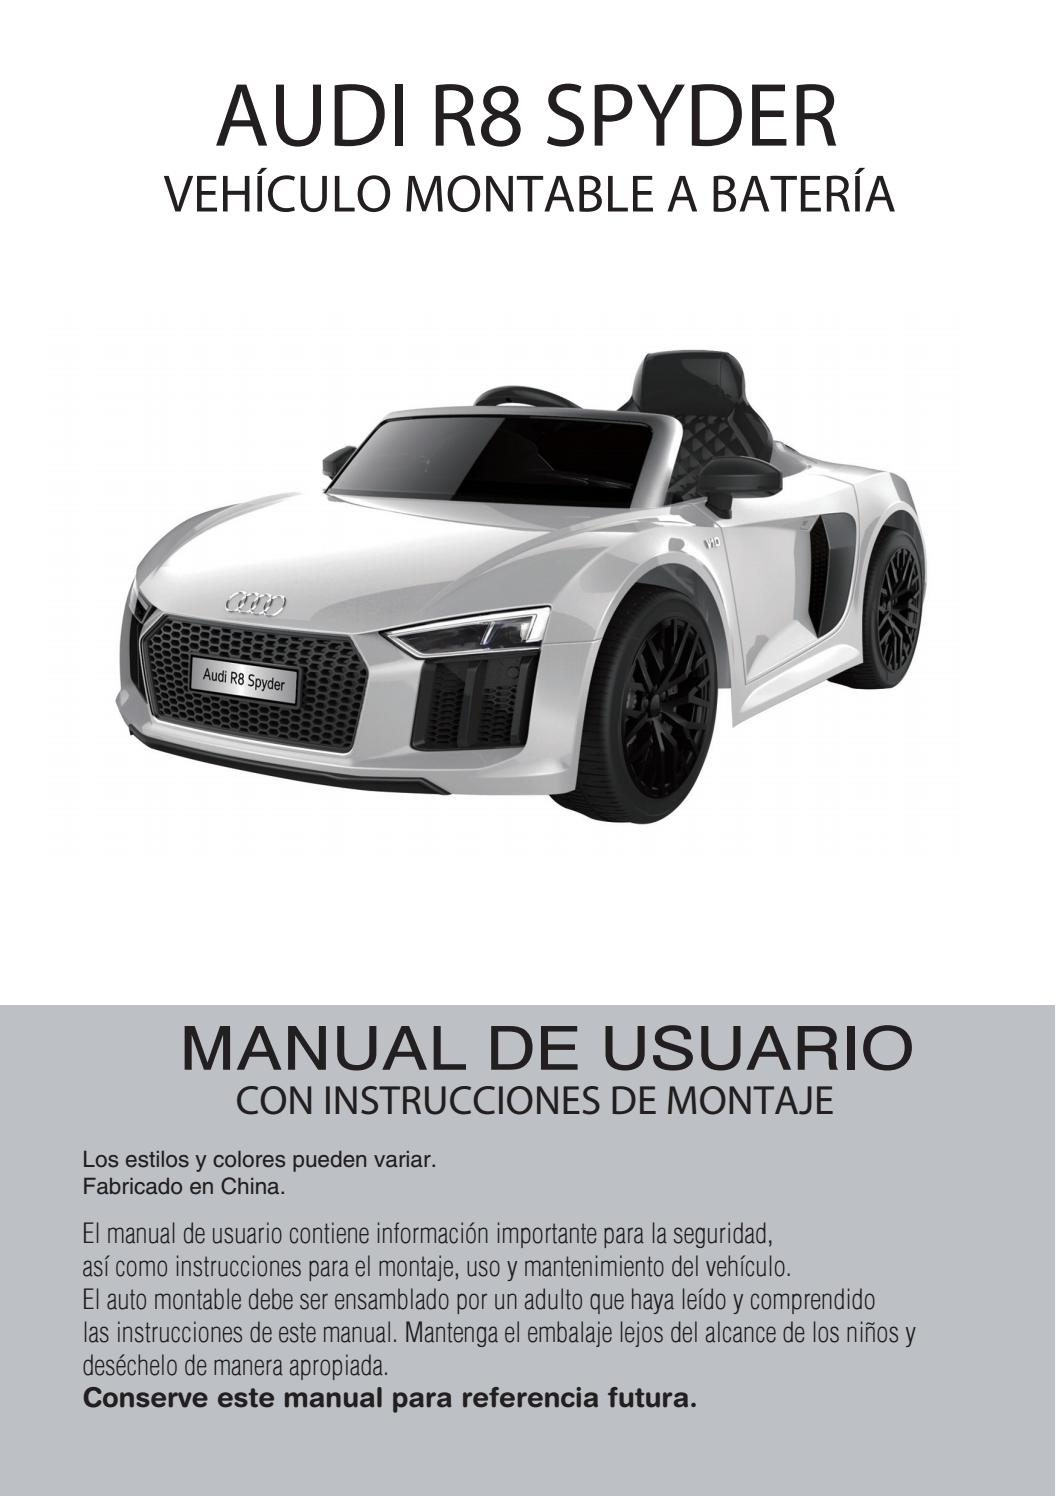 De Sudamericana Manual Issuu Spyder Audi Importadora R8 Usuario By Fc1u5JTlK3